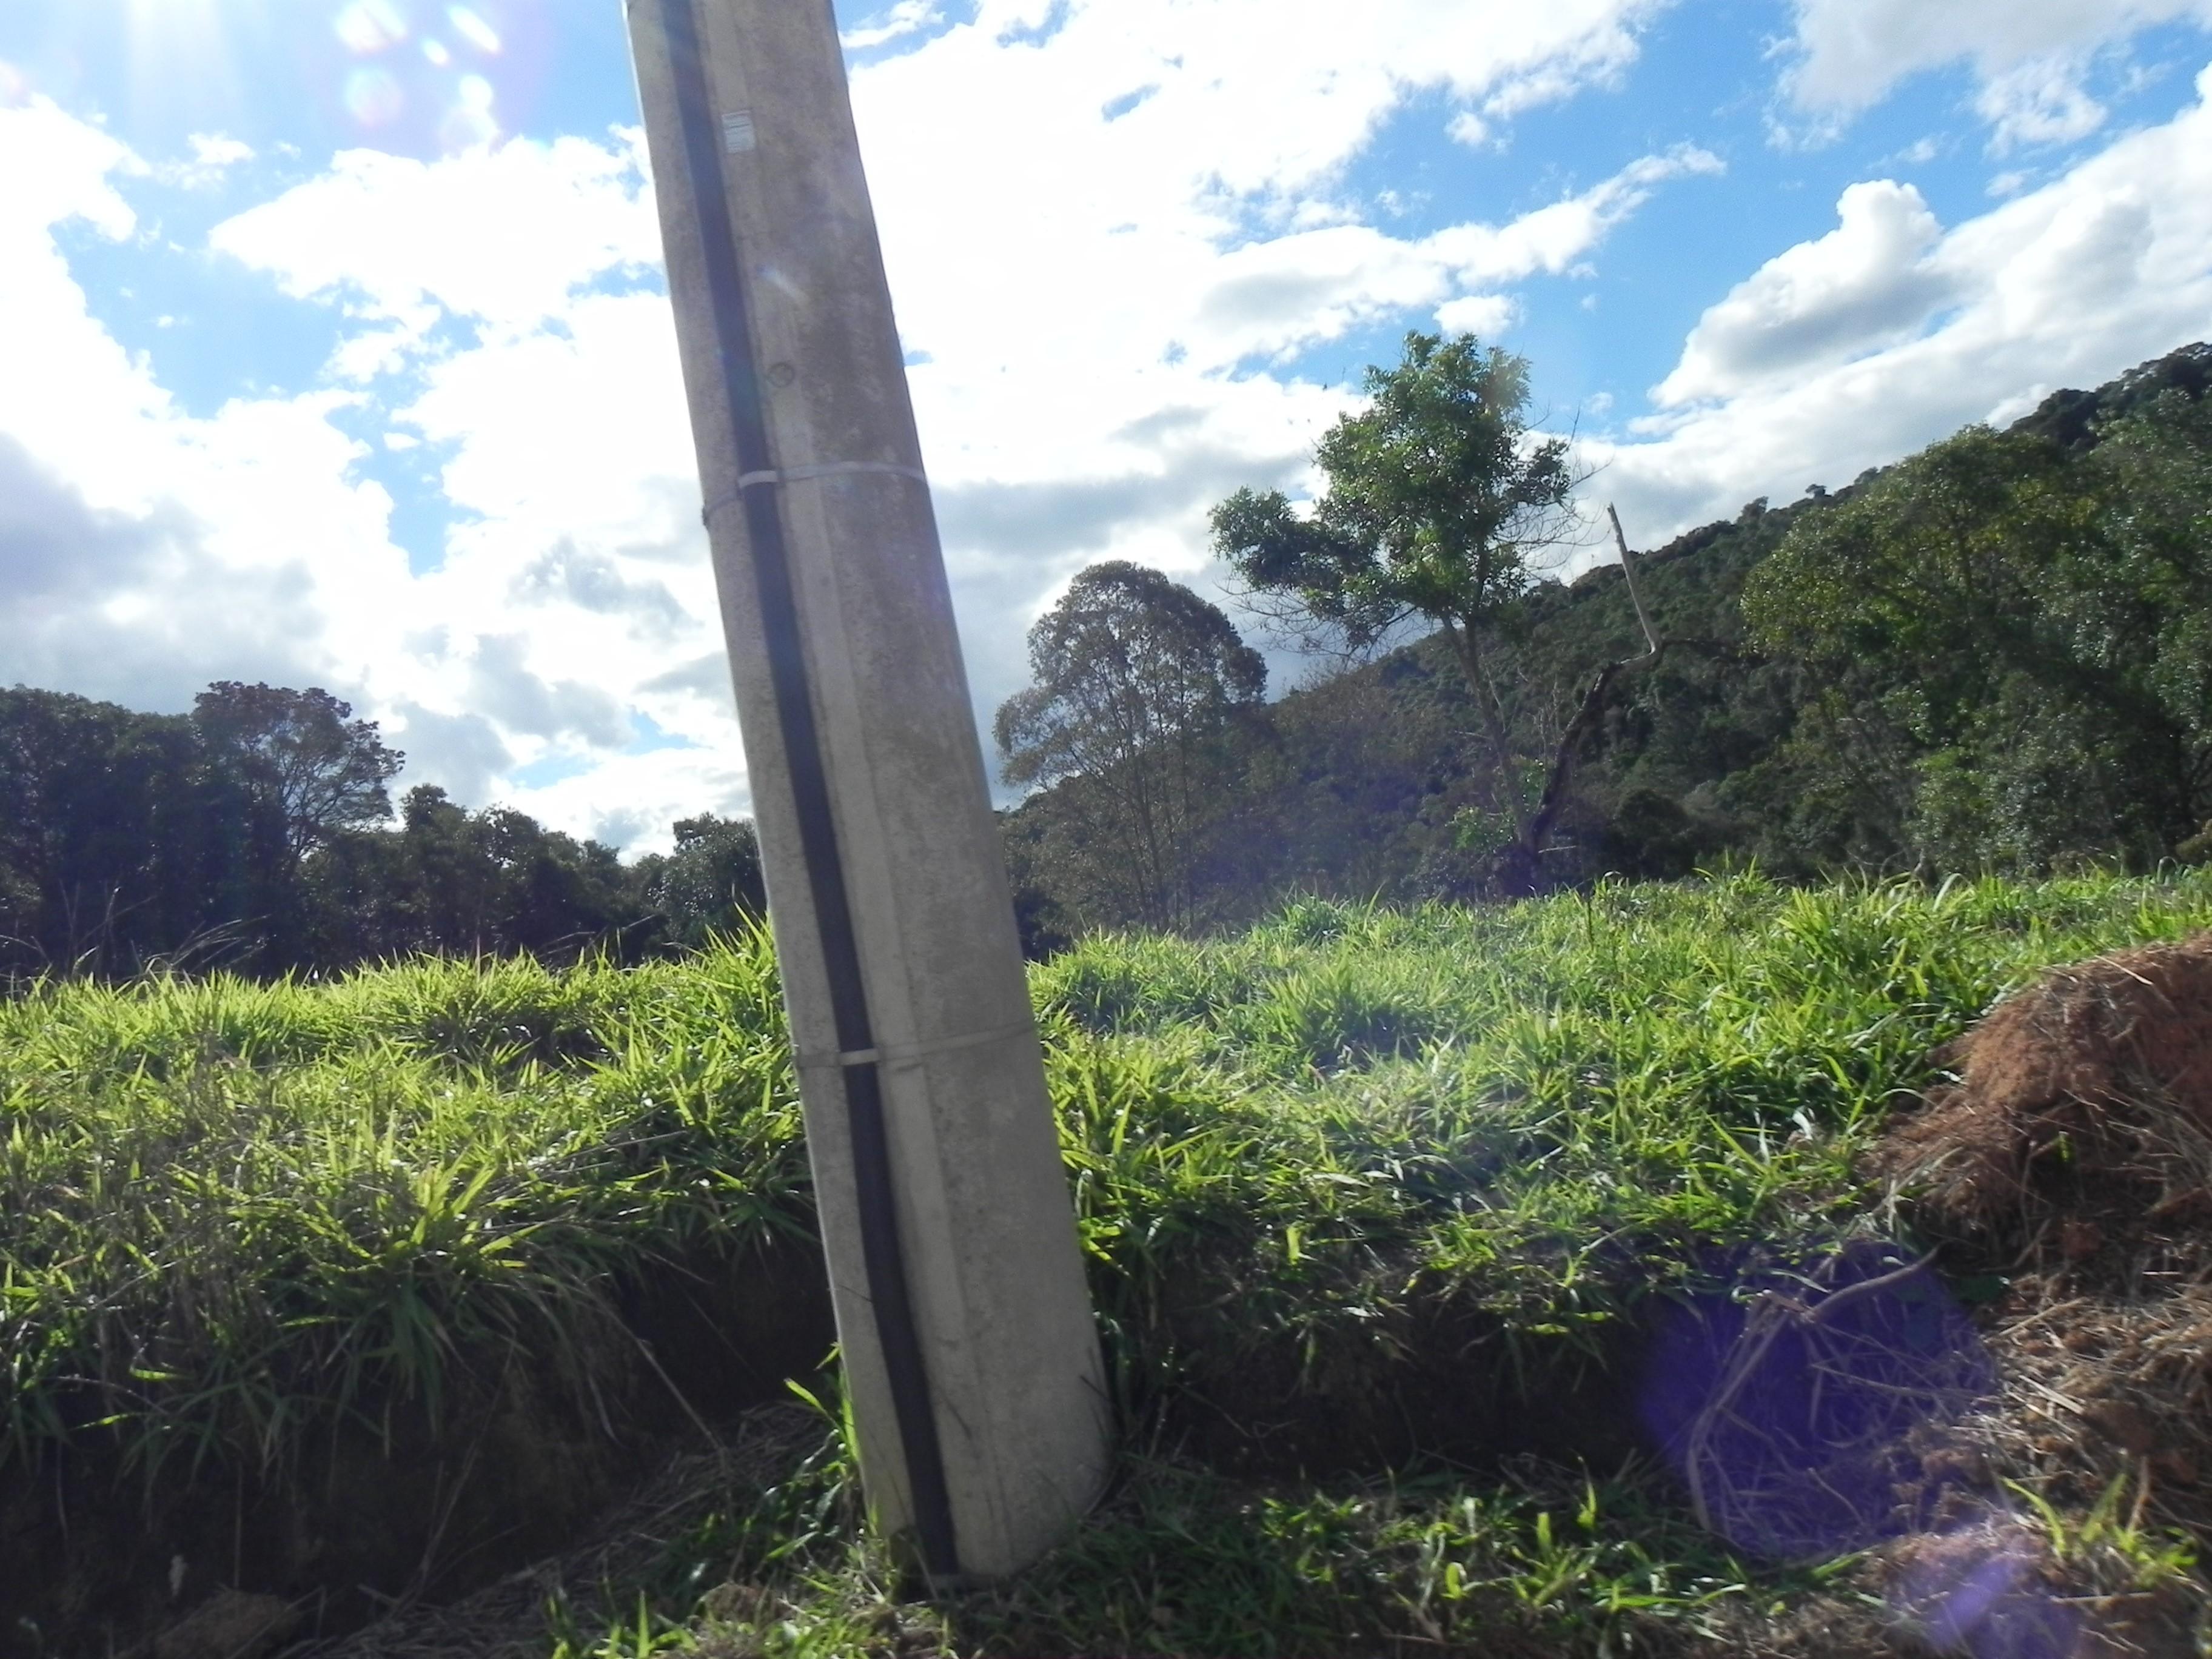 (K.A) terrenos em terr preta